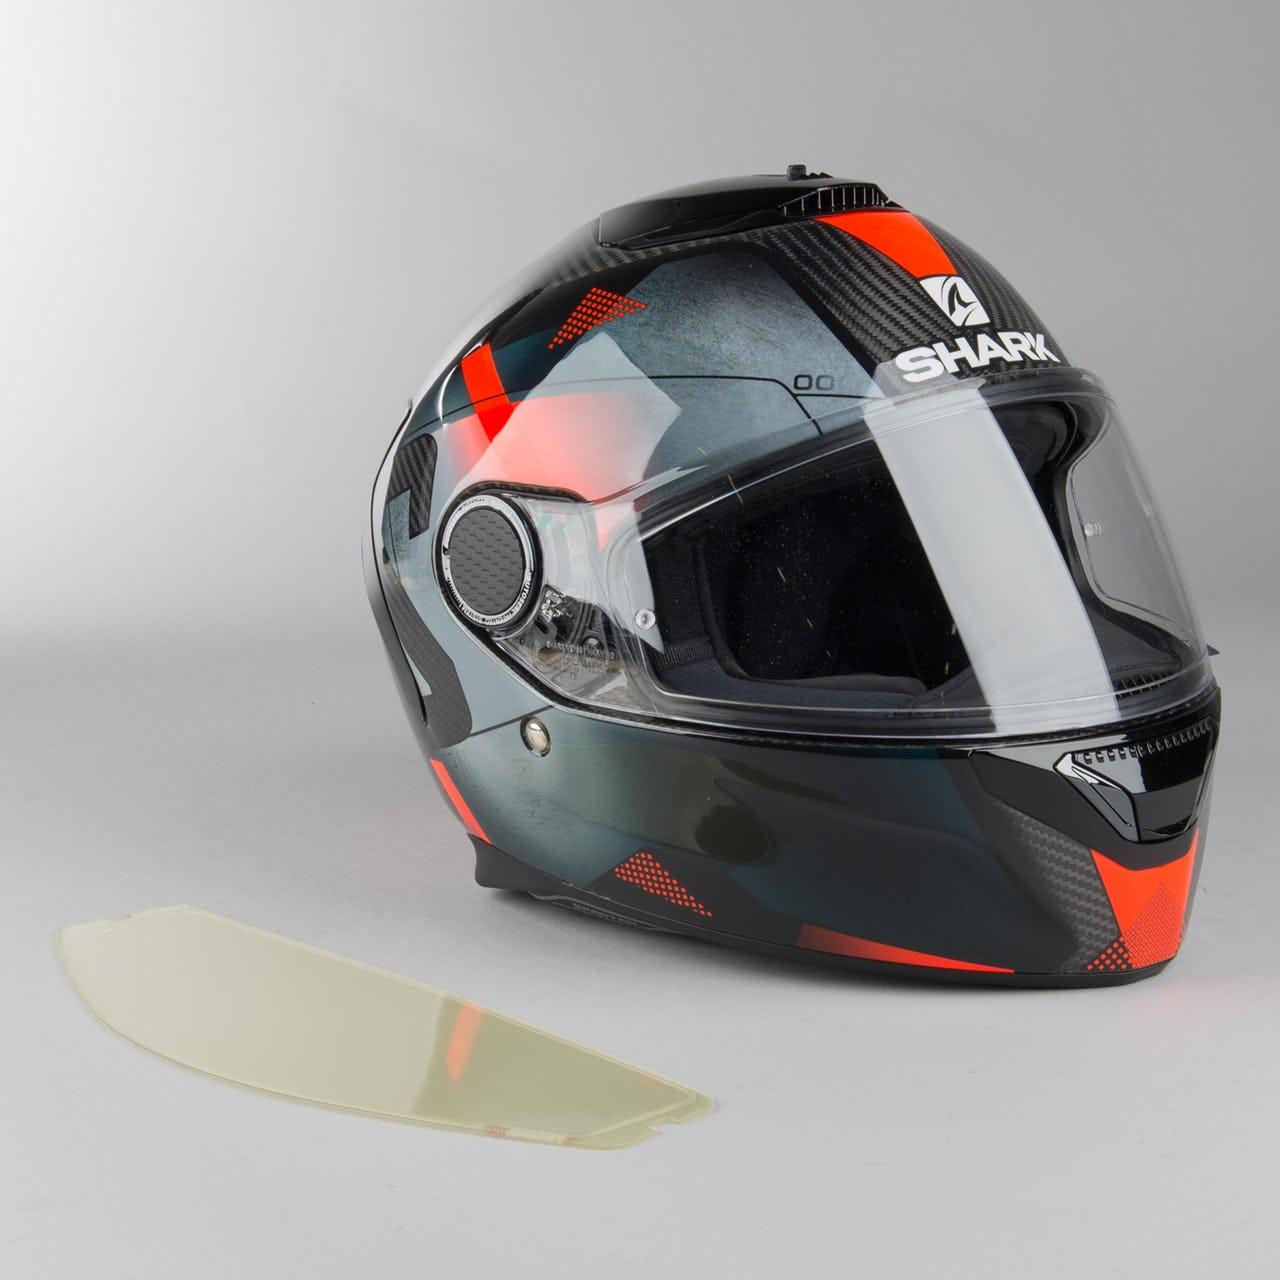 Shark Spartan Carbon Motorcycle Helmet - Kitari £169.99 @ XLMoto